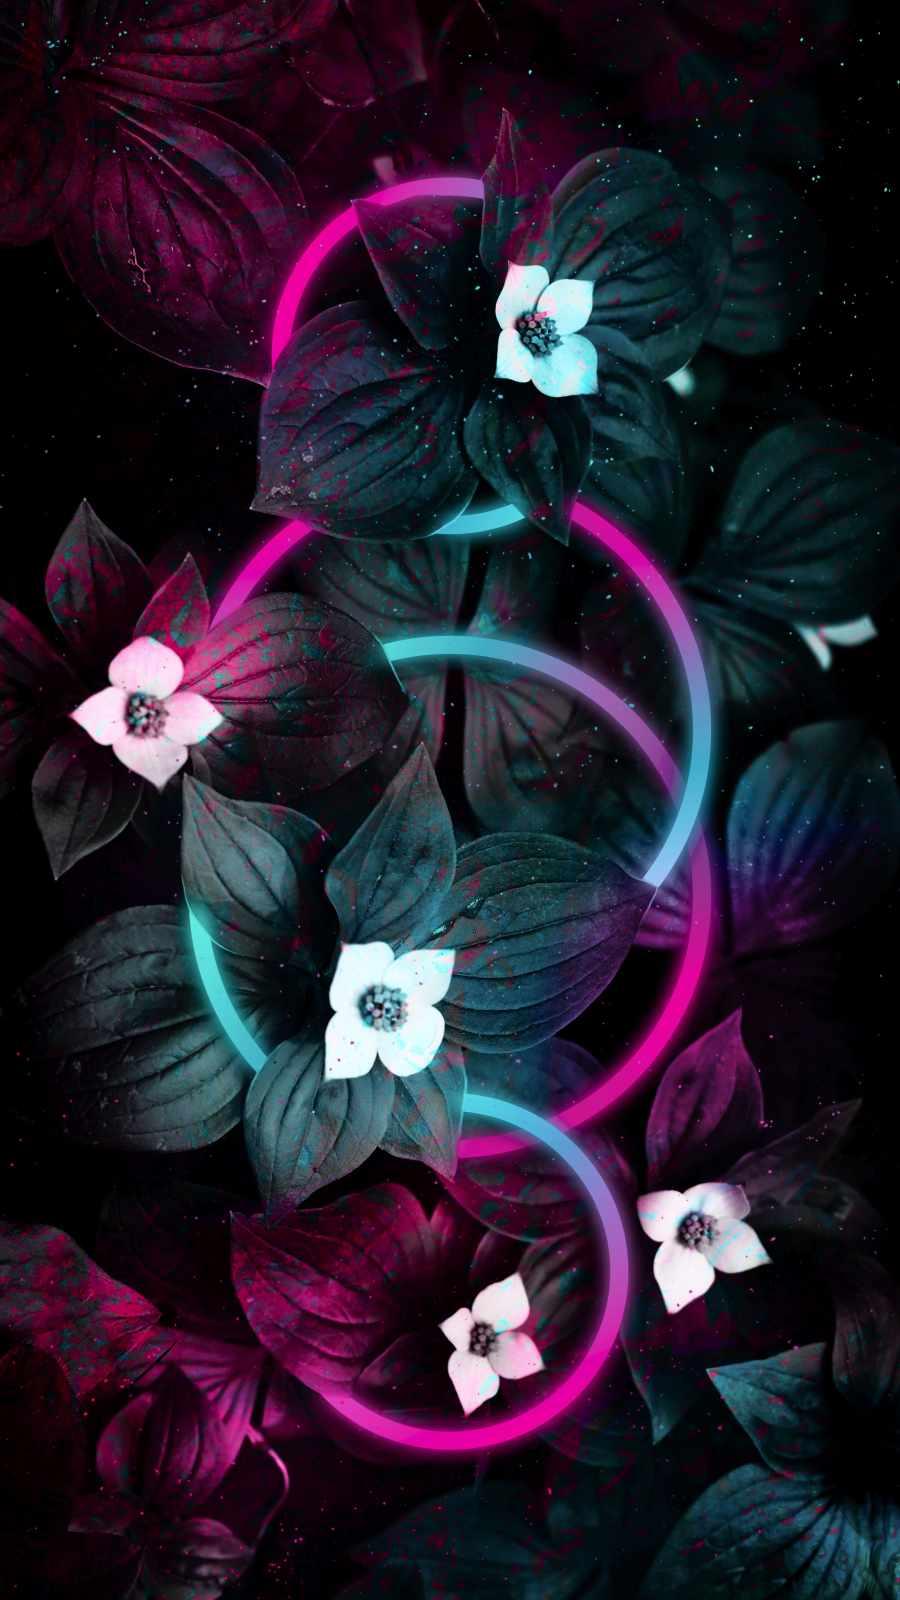 Neon Rings in Flower Foliage